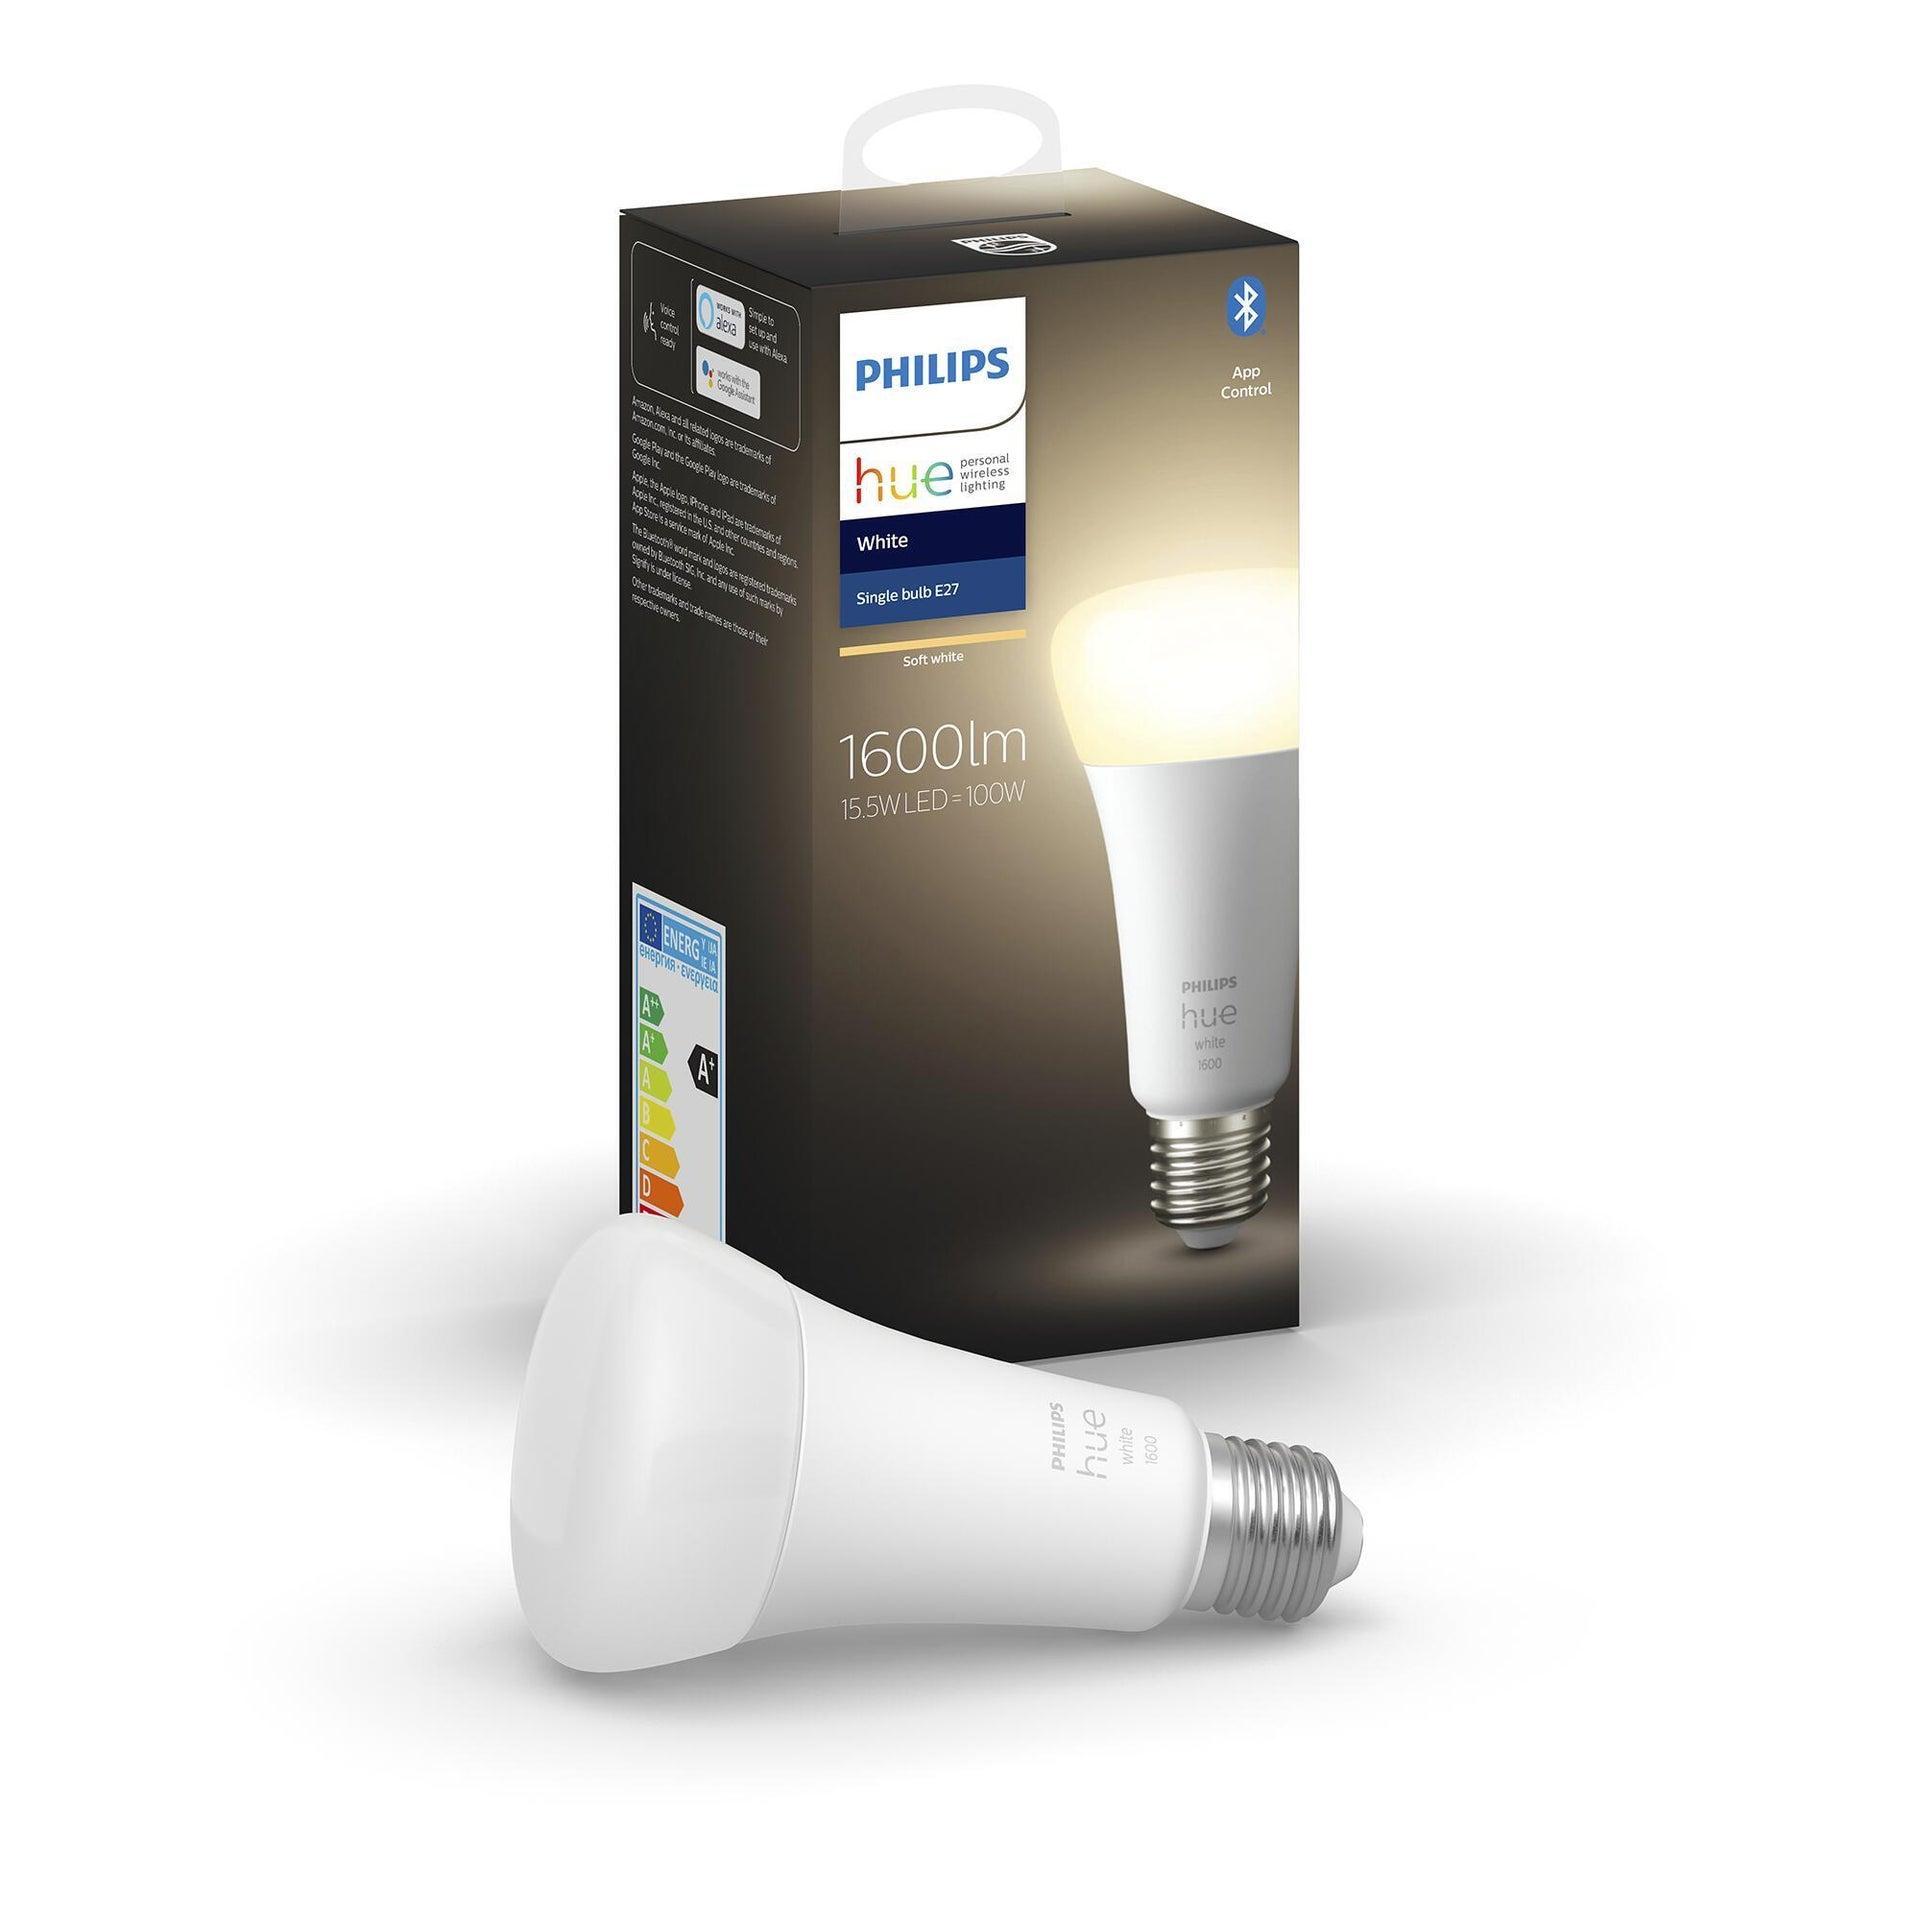 Lampadina smart lighting LED, HUE WHITE BLUETOOTH, E27, Goccia, Opaco, Luce calda, 15.5W=1600LM (equiv 100 W), 150° , PHILIPS HUE - 11